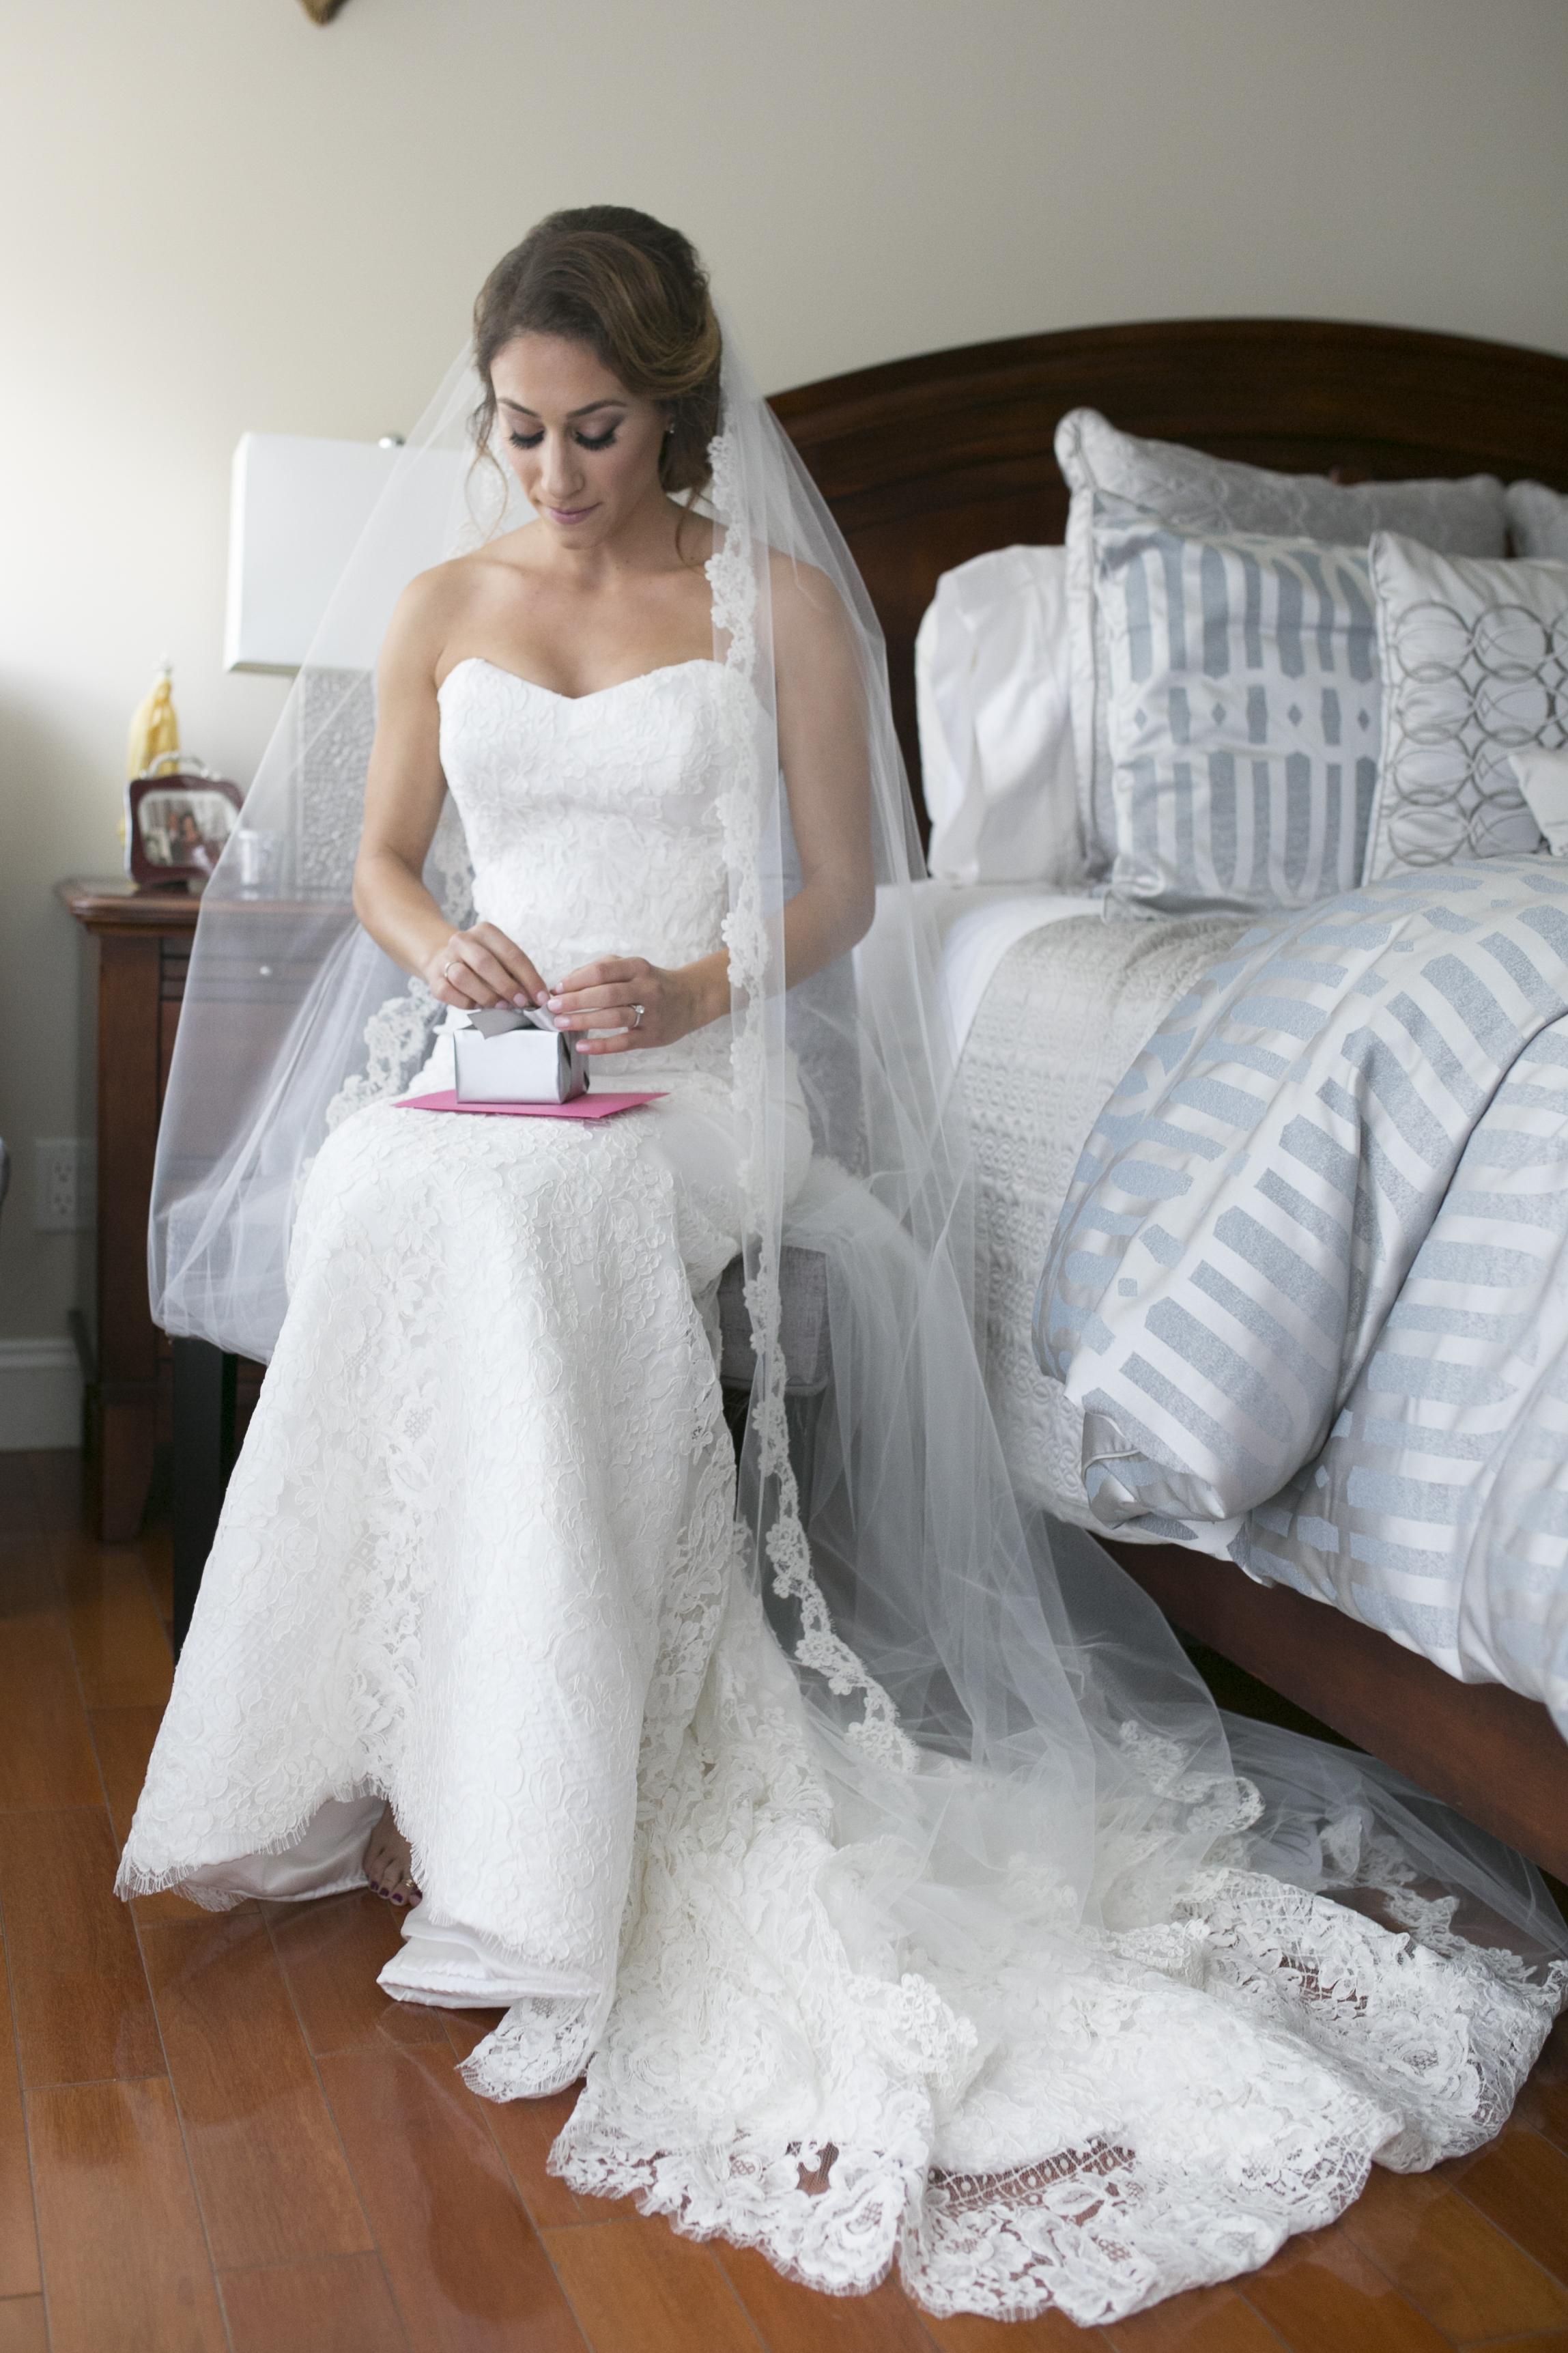 Persian Wedding-South San Francisco-Meo Baaklini18.jpg